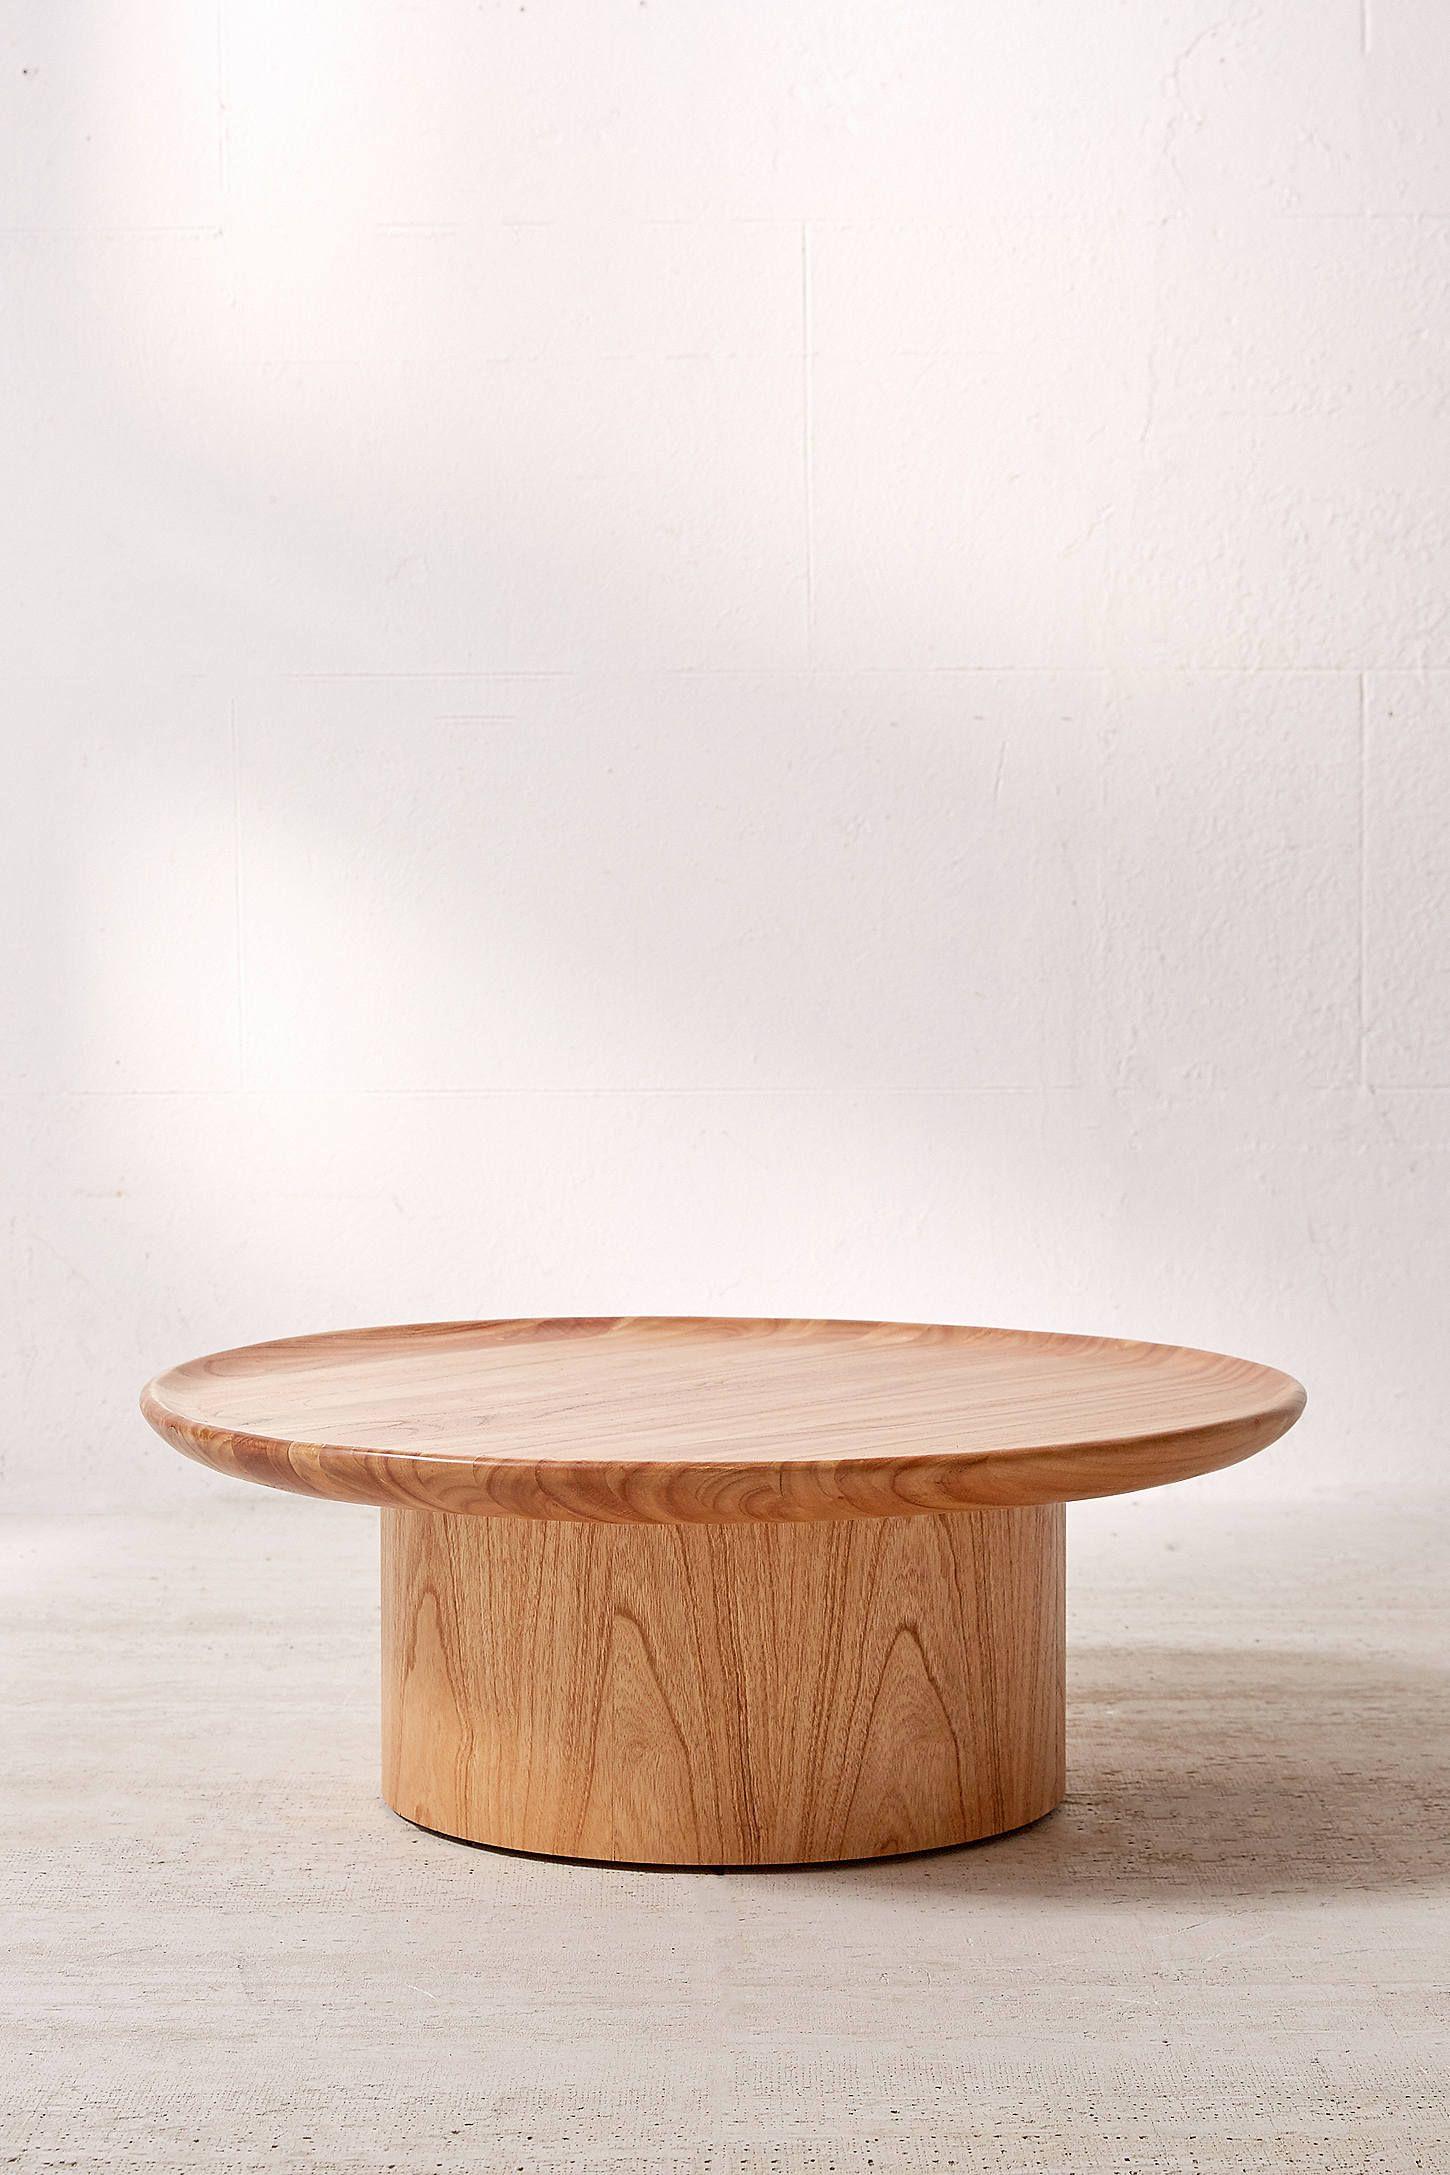 Matro Wood Coffee Table Round Wood Coffee Table Coffee Table Wood Coffee Table [ 2175 x 1450 Pixel ]